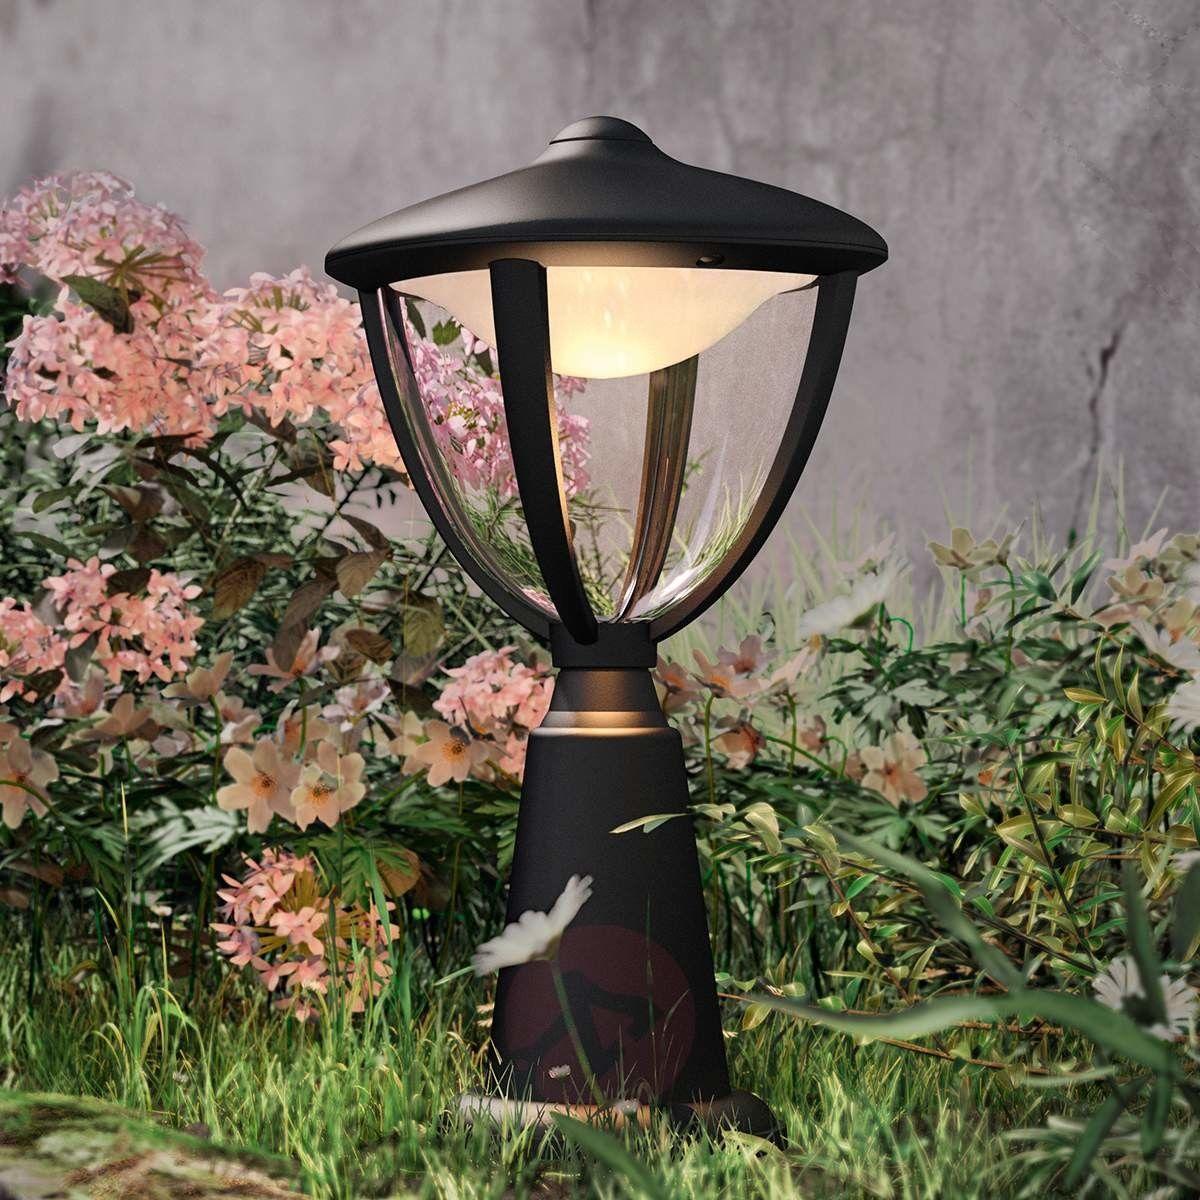 --- WYSYLKA 24H --- Lampa stojąca PHILIPS Robin 15472/30/16 led ledy 154723016